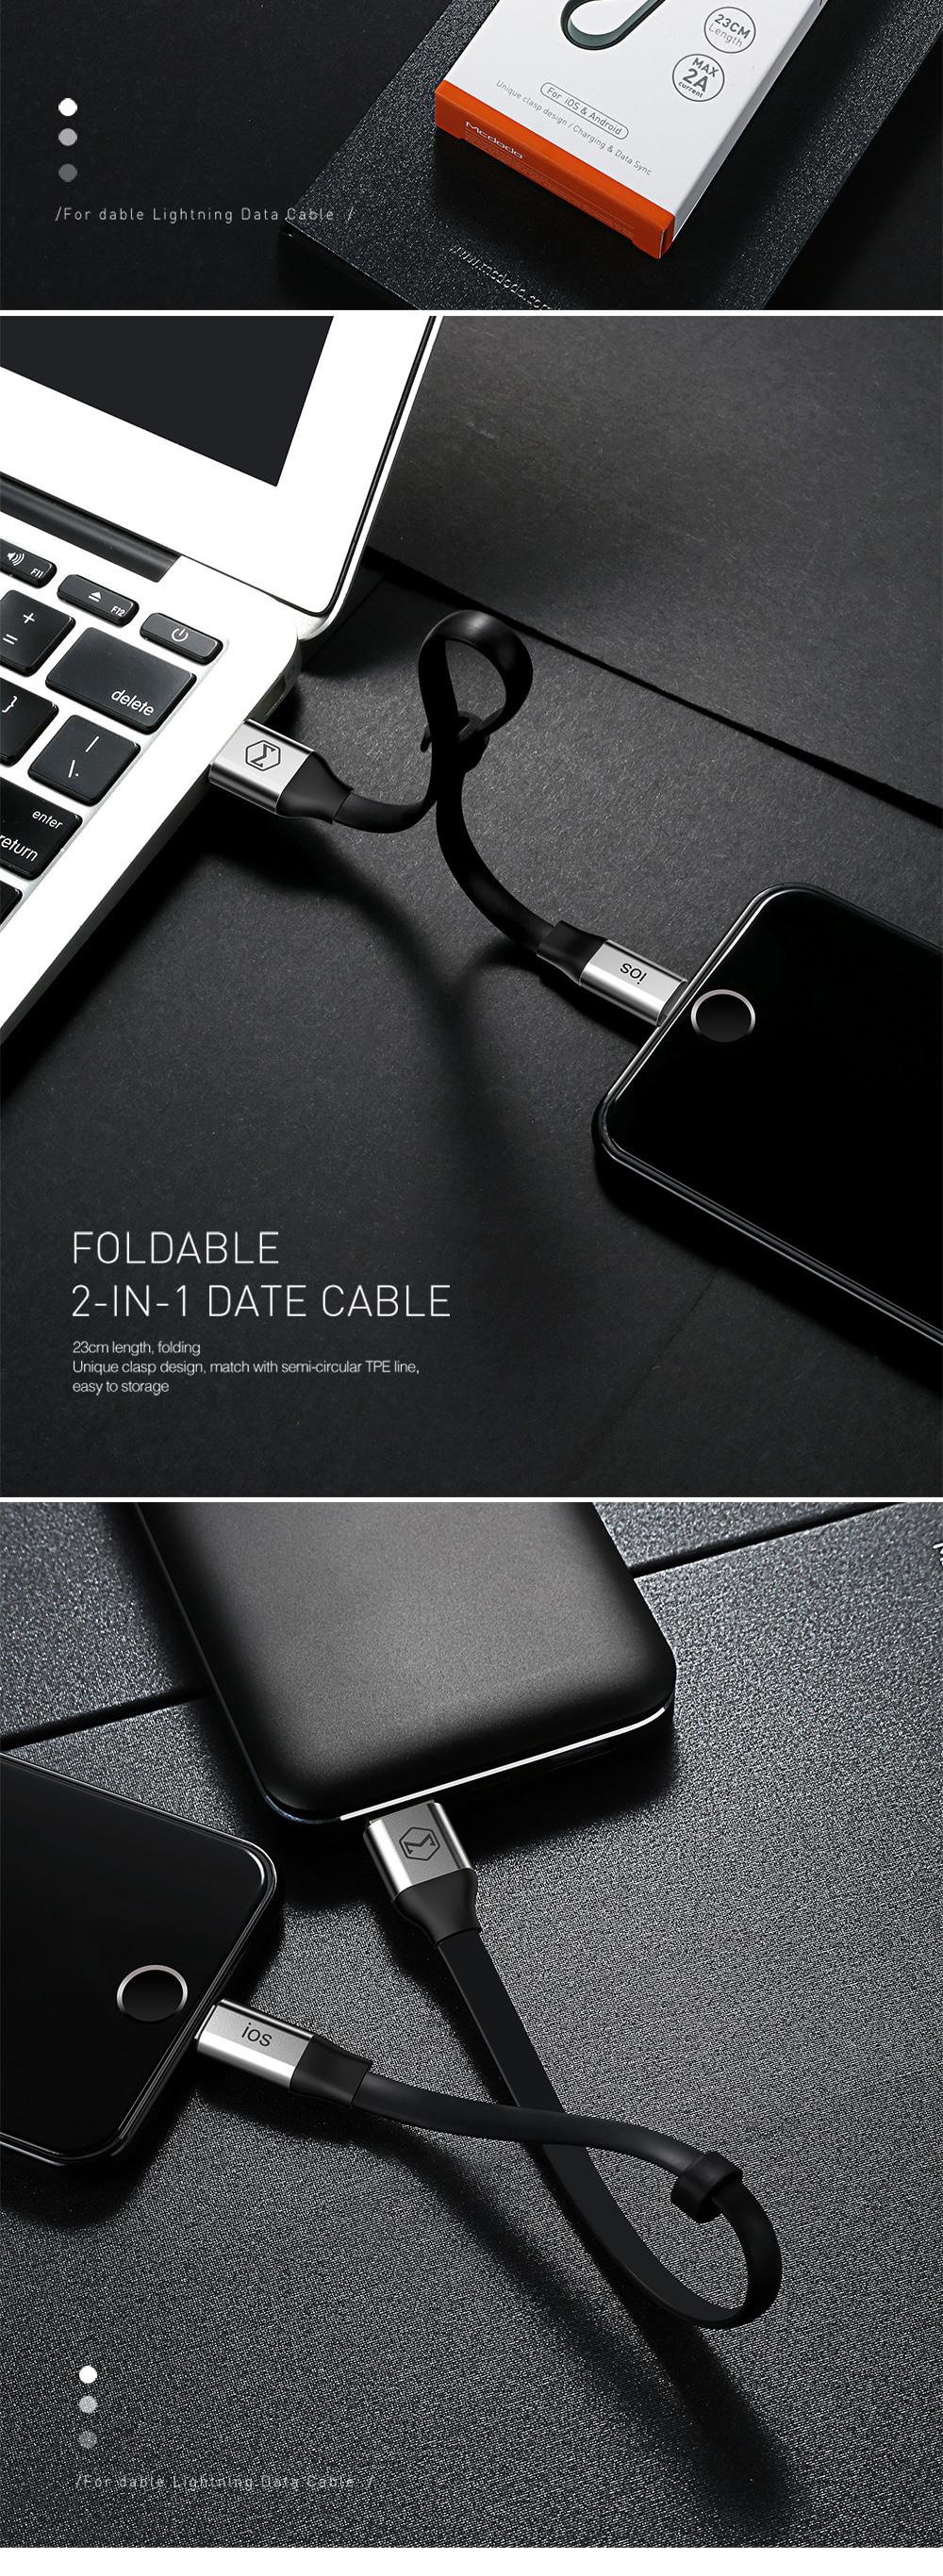 Mcdodo 5핀 8핀 2in1 고속충전 케이블 23cm13,500원-맥도도디지털/핸드폰, 스마트기기 주변기기, 케이블, 8핀바보사랑Mcdodo 5핀 8핀 2in1 고속충전 케이블 23cm13,500원-맥도도디지털/핸드폰, 스마트기기 주변기기, 케이블, 8핀바보사랑